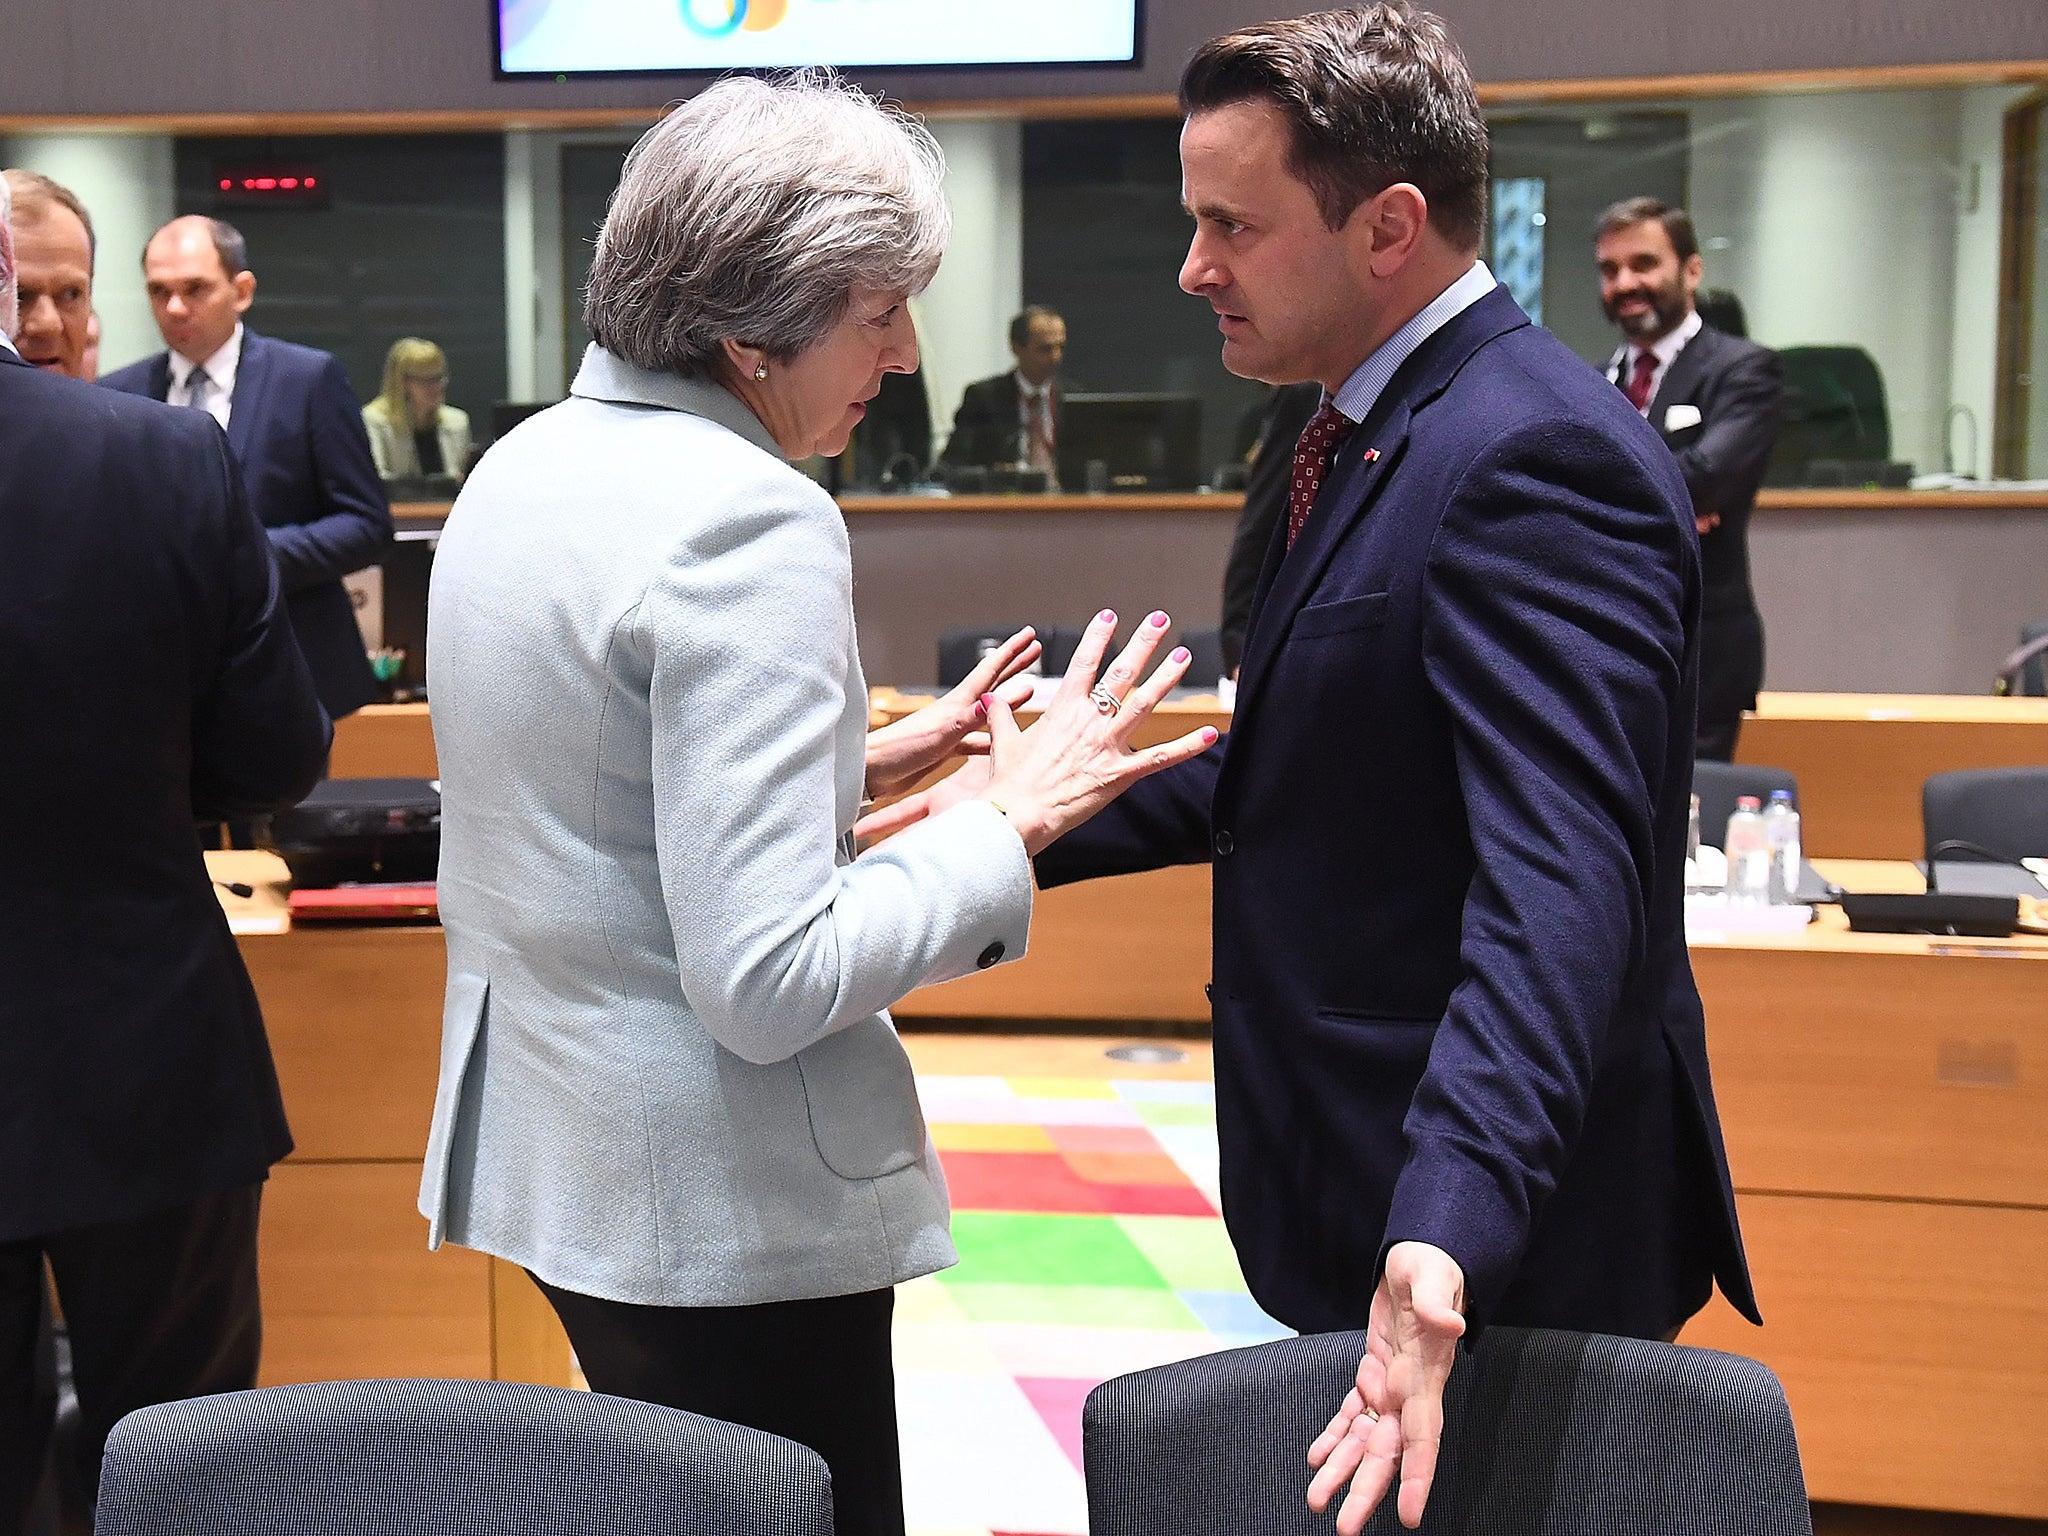 No Brexit renegotiation if MPs reject deal Theresa May gets, EU leader warns